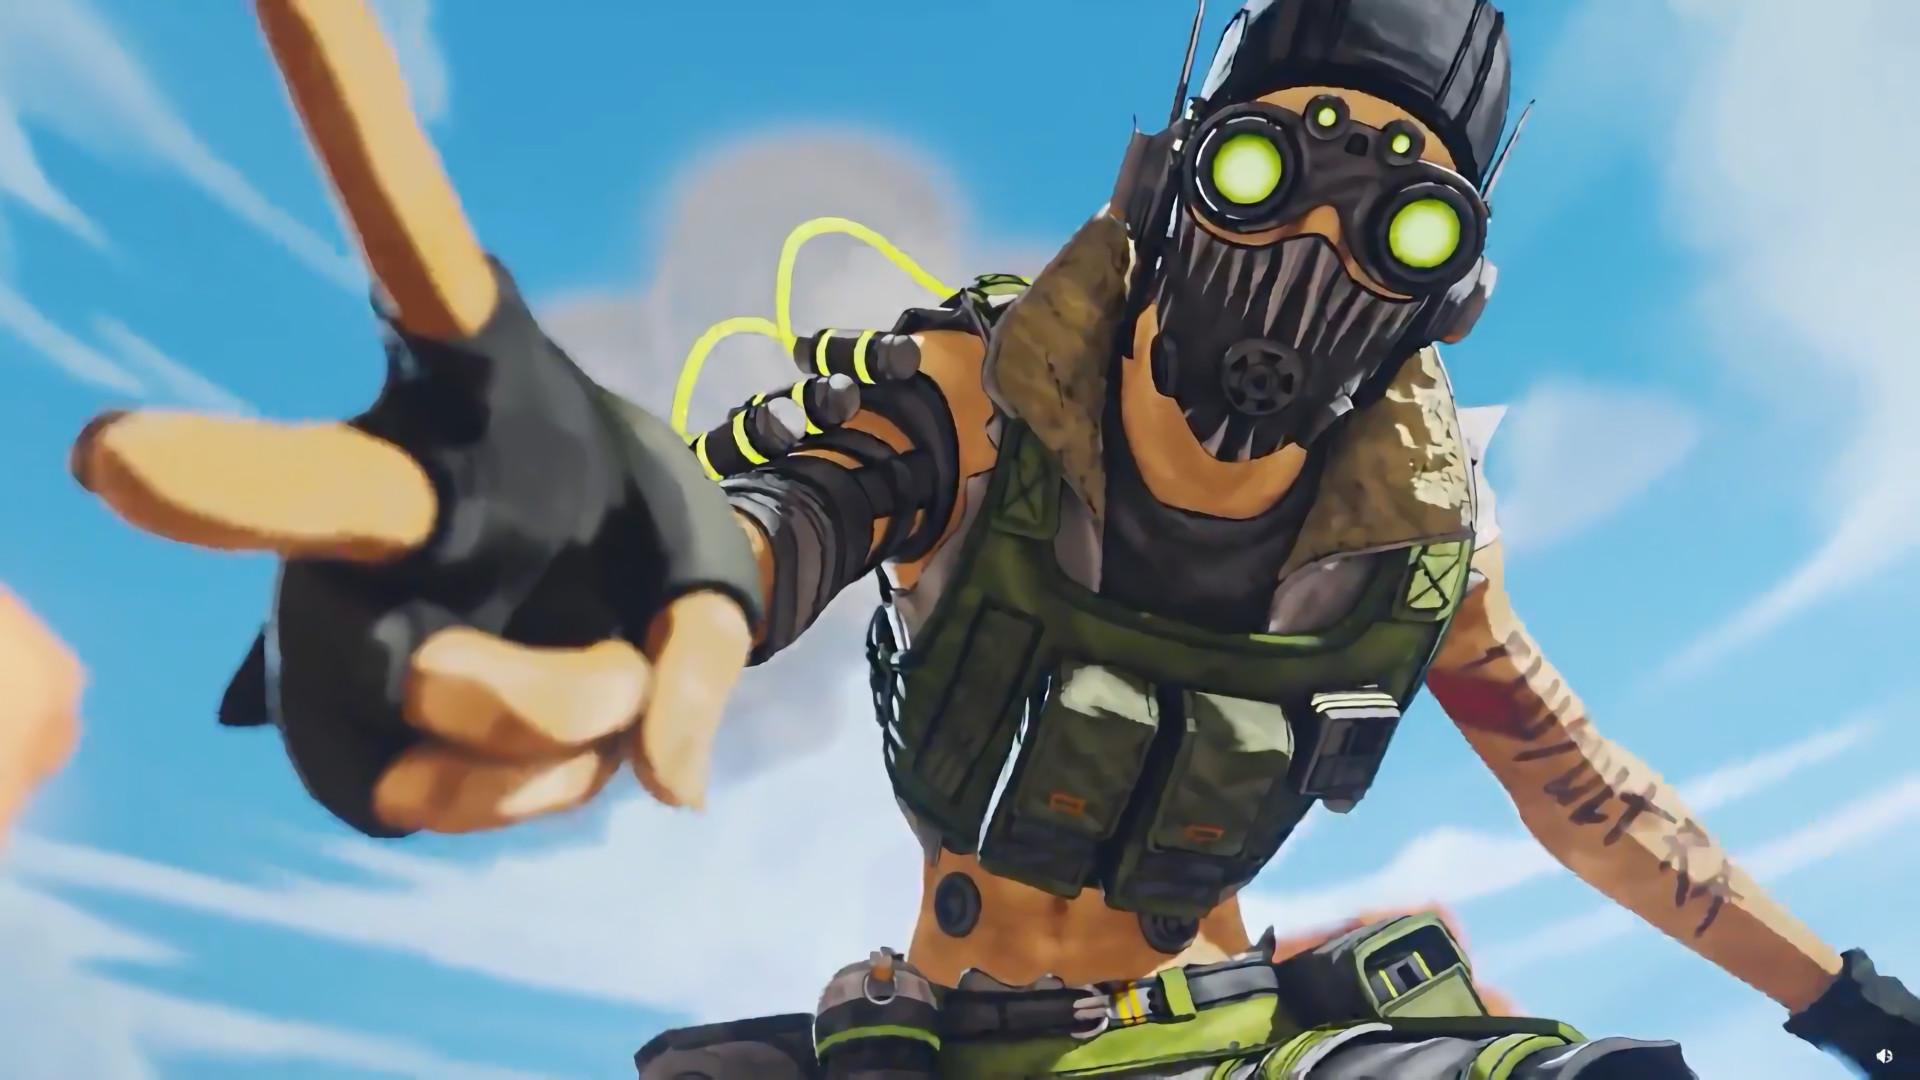 PC Invasion - Apex Legends player discovers Octane health regeneration  secret buff - Steam News